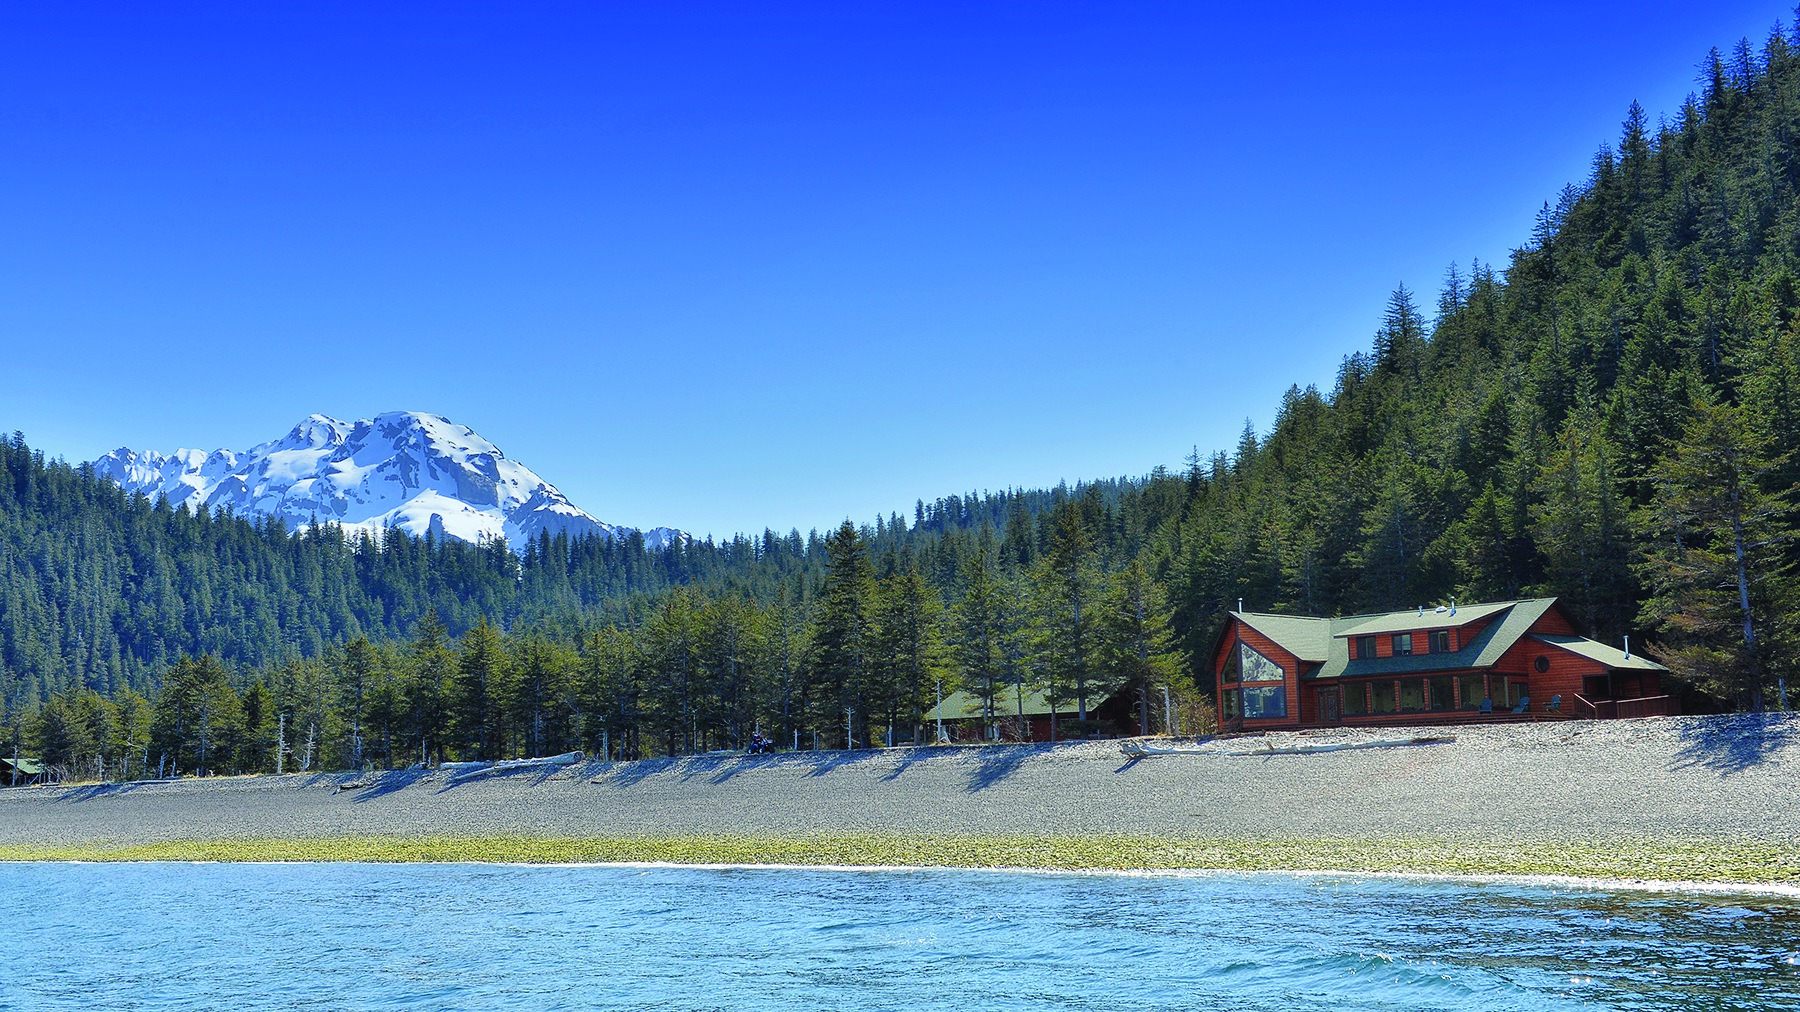 05-kenai-fjords-wilderness-lodge